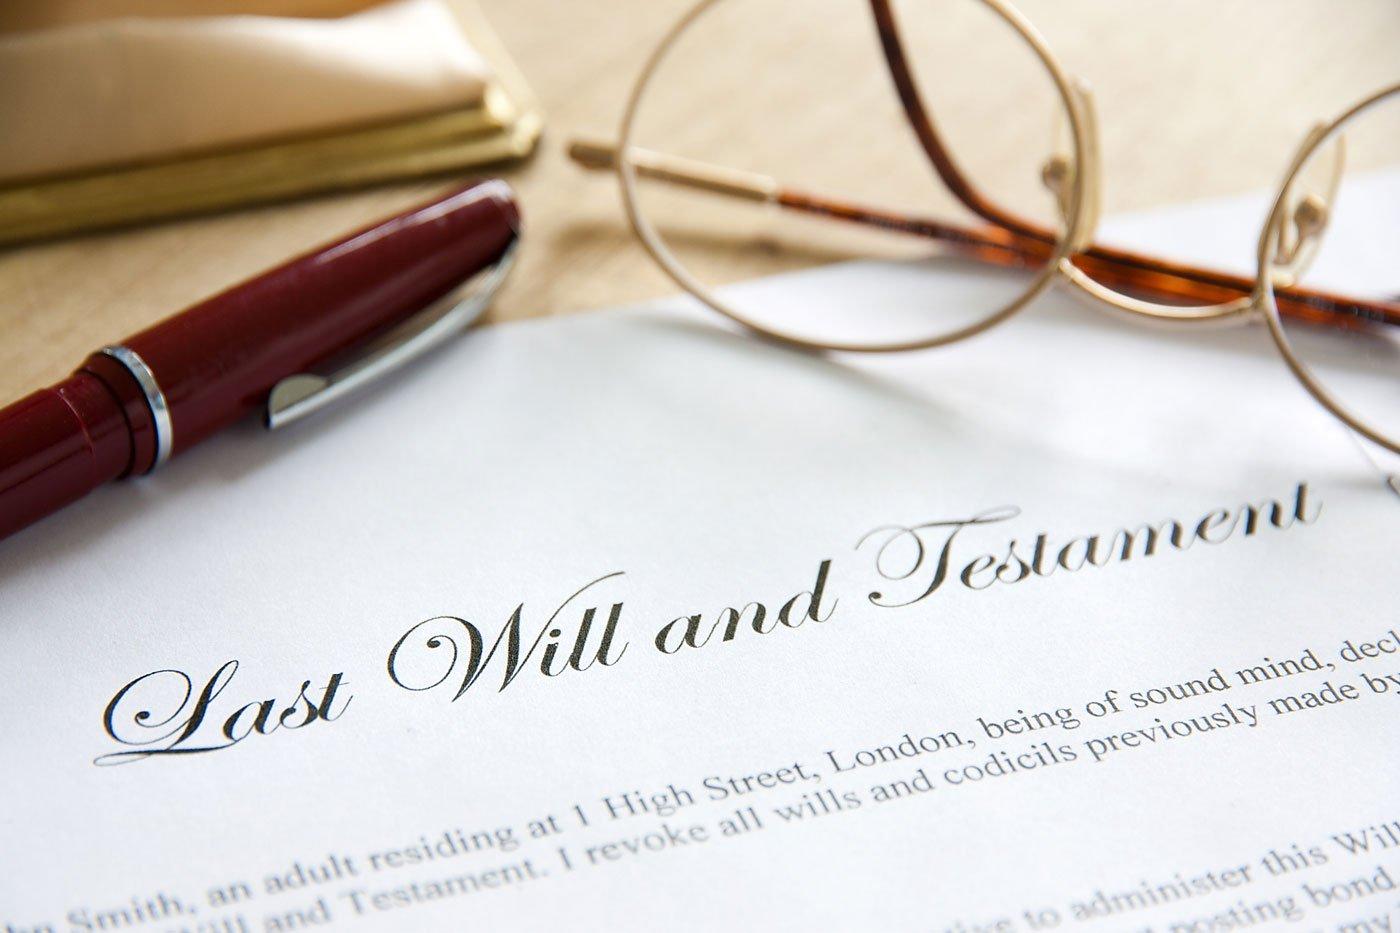 Atlanta Trust & Estate Law